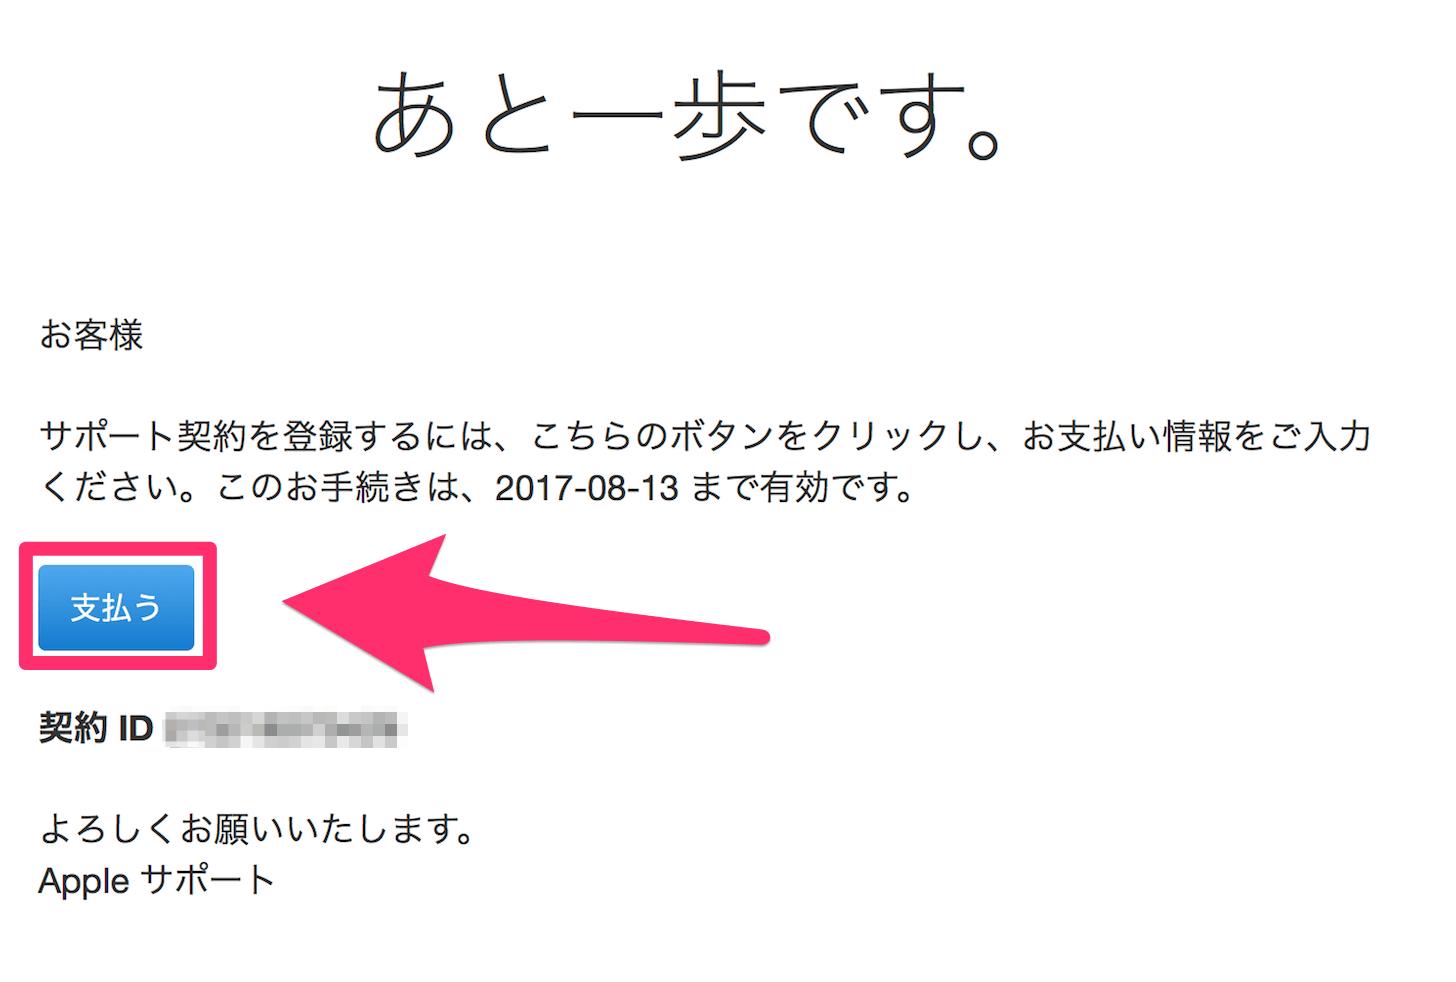 AppleCare 04